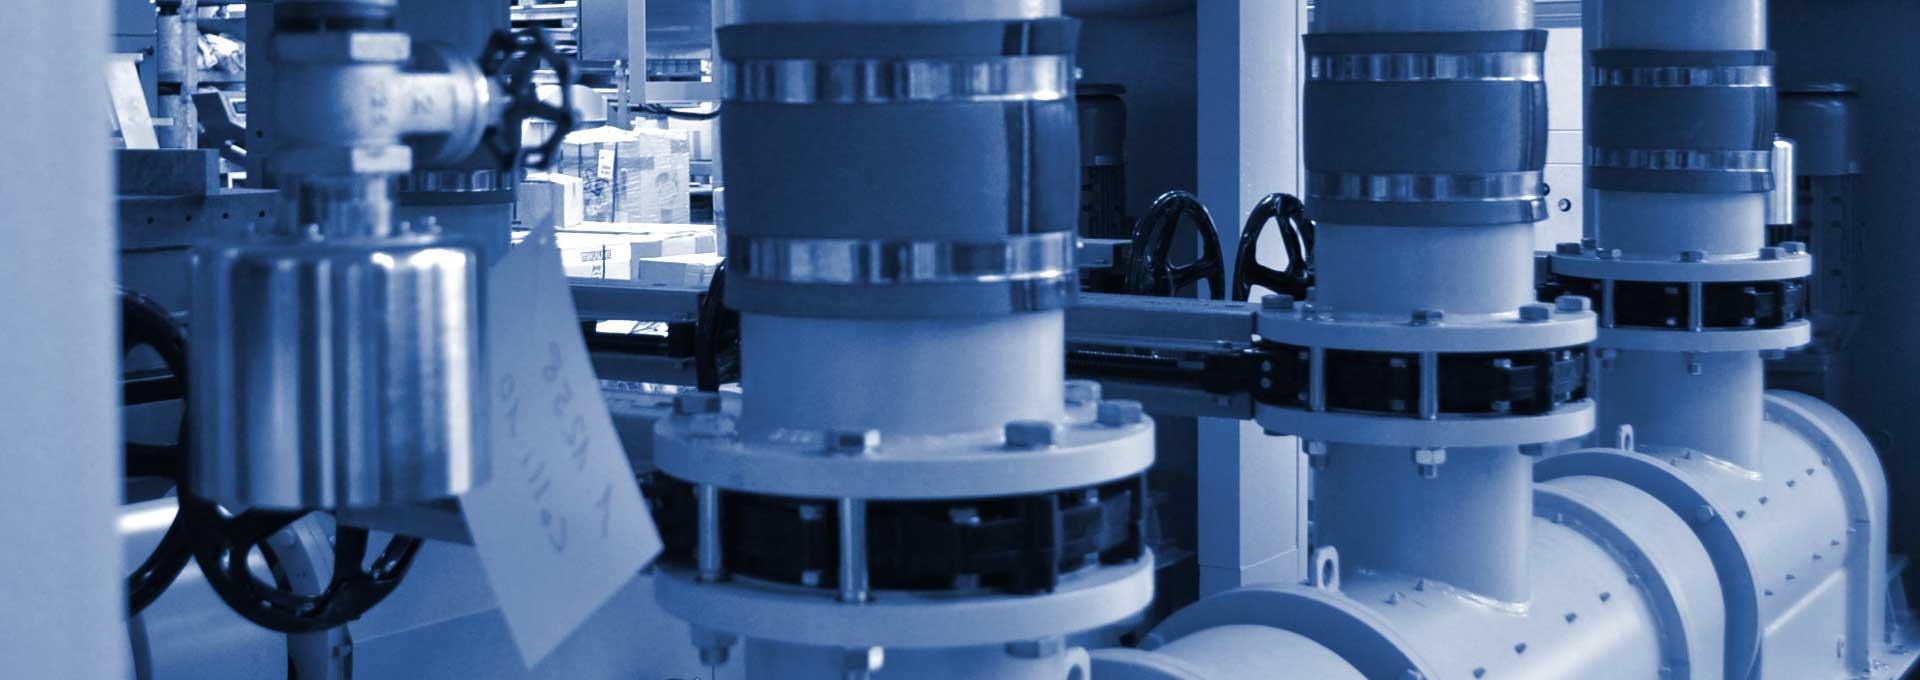 Montage - Hümmler Maschinenbau